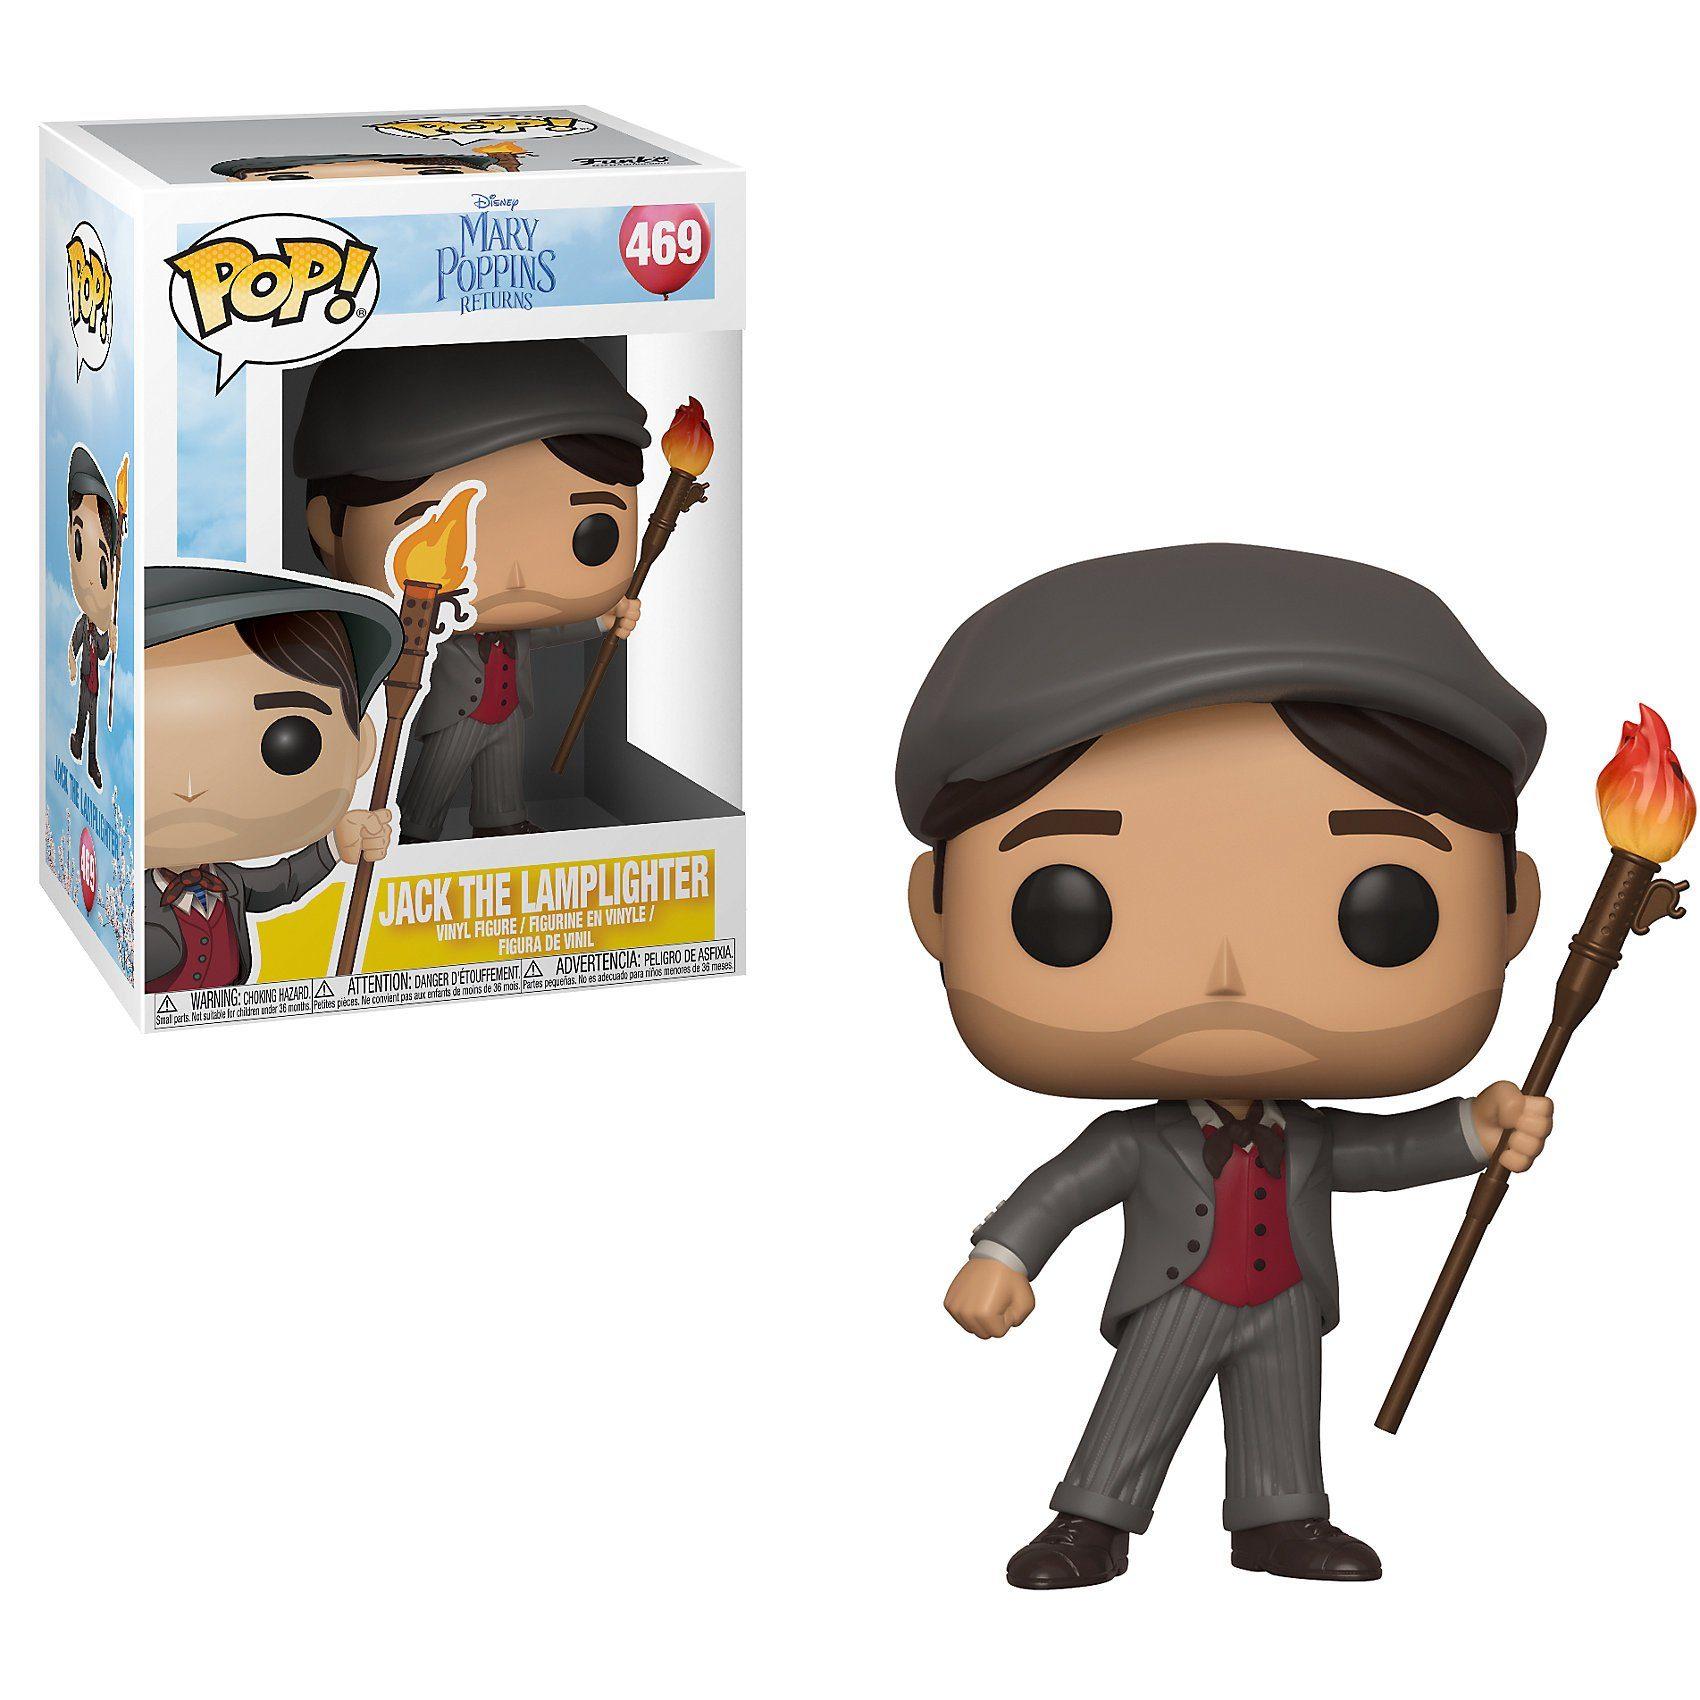 Funko POP! Disney: Mary Poppins - Jack the Lamplighter